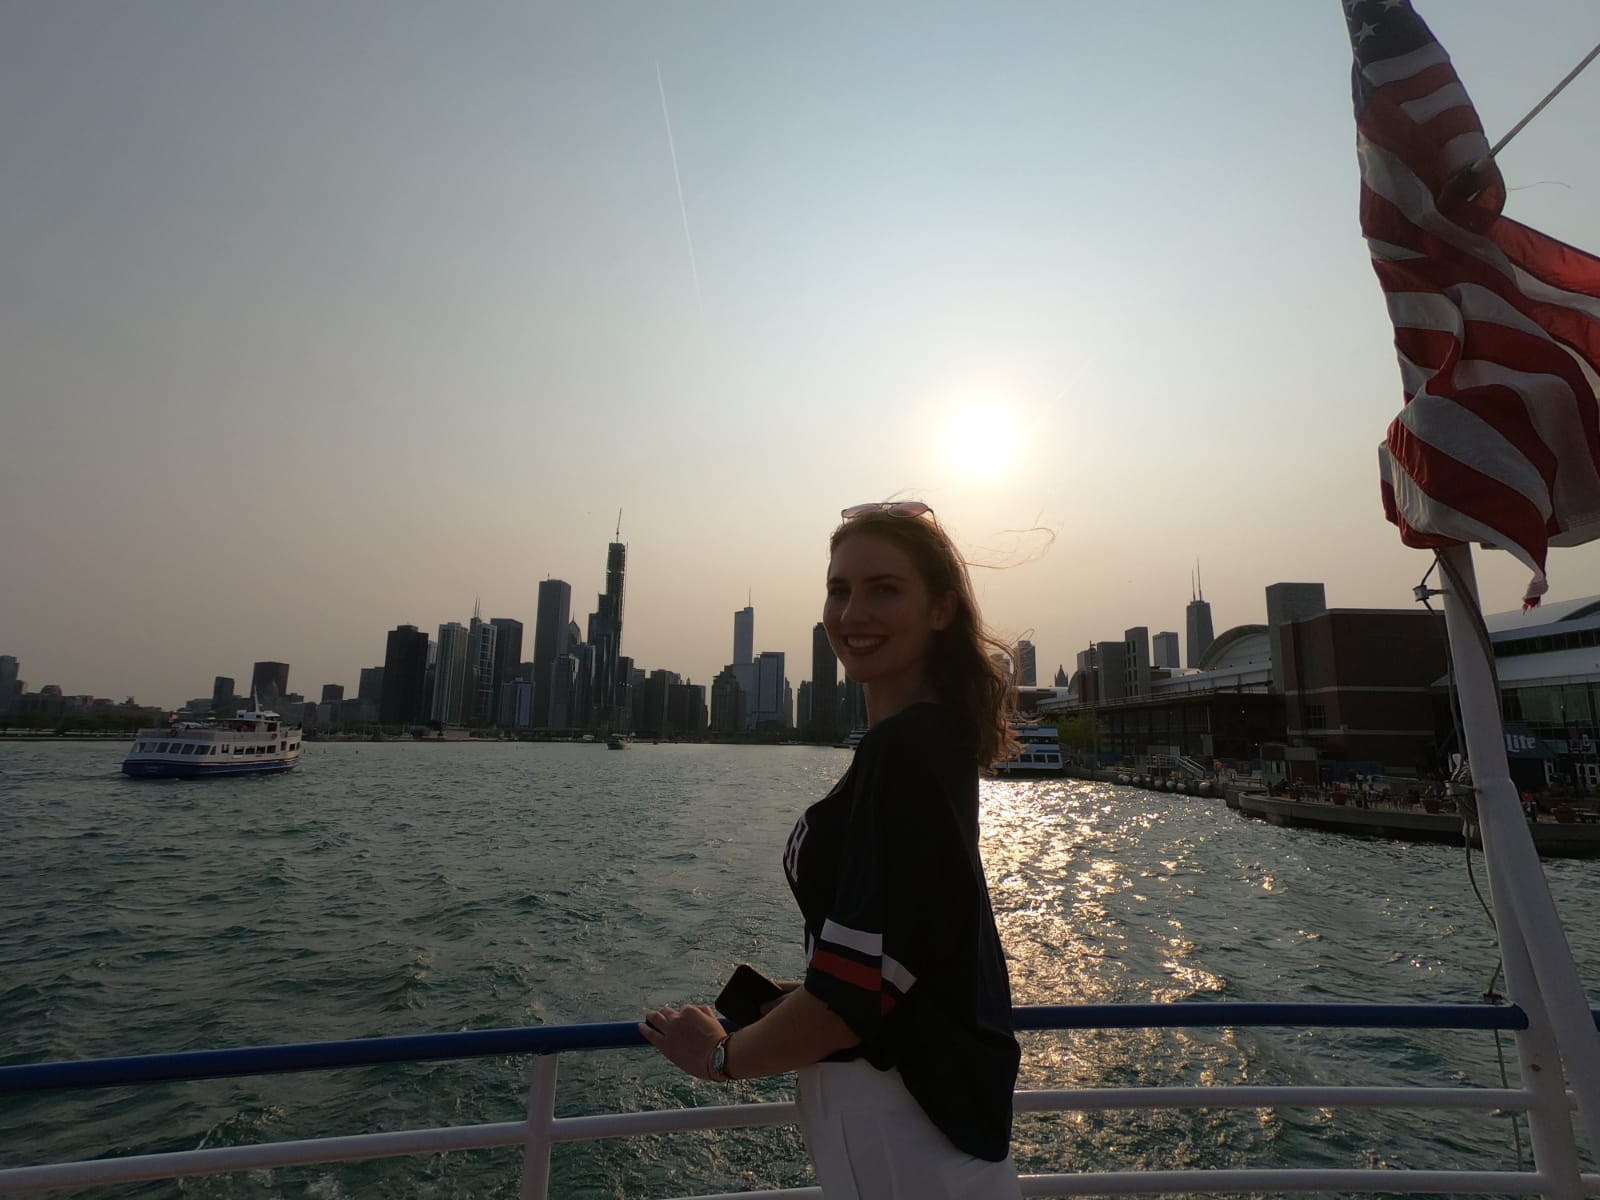 Michigan lake cruise